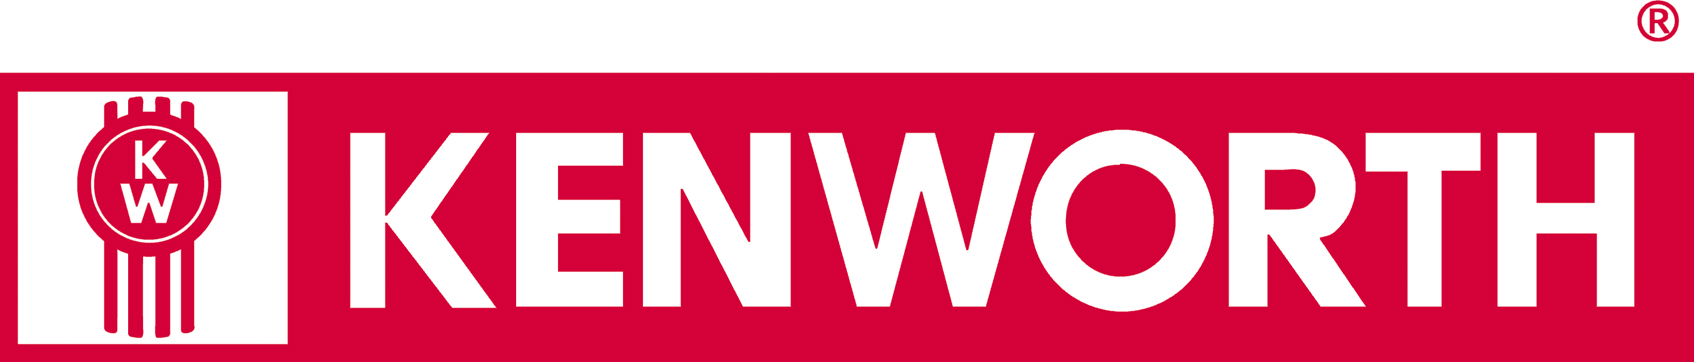 kenworth logo.jpg